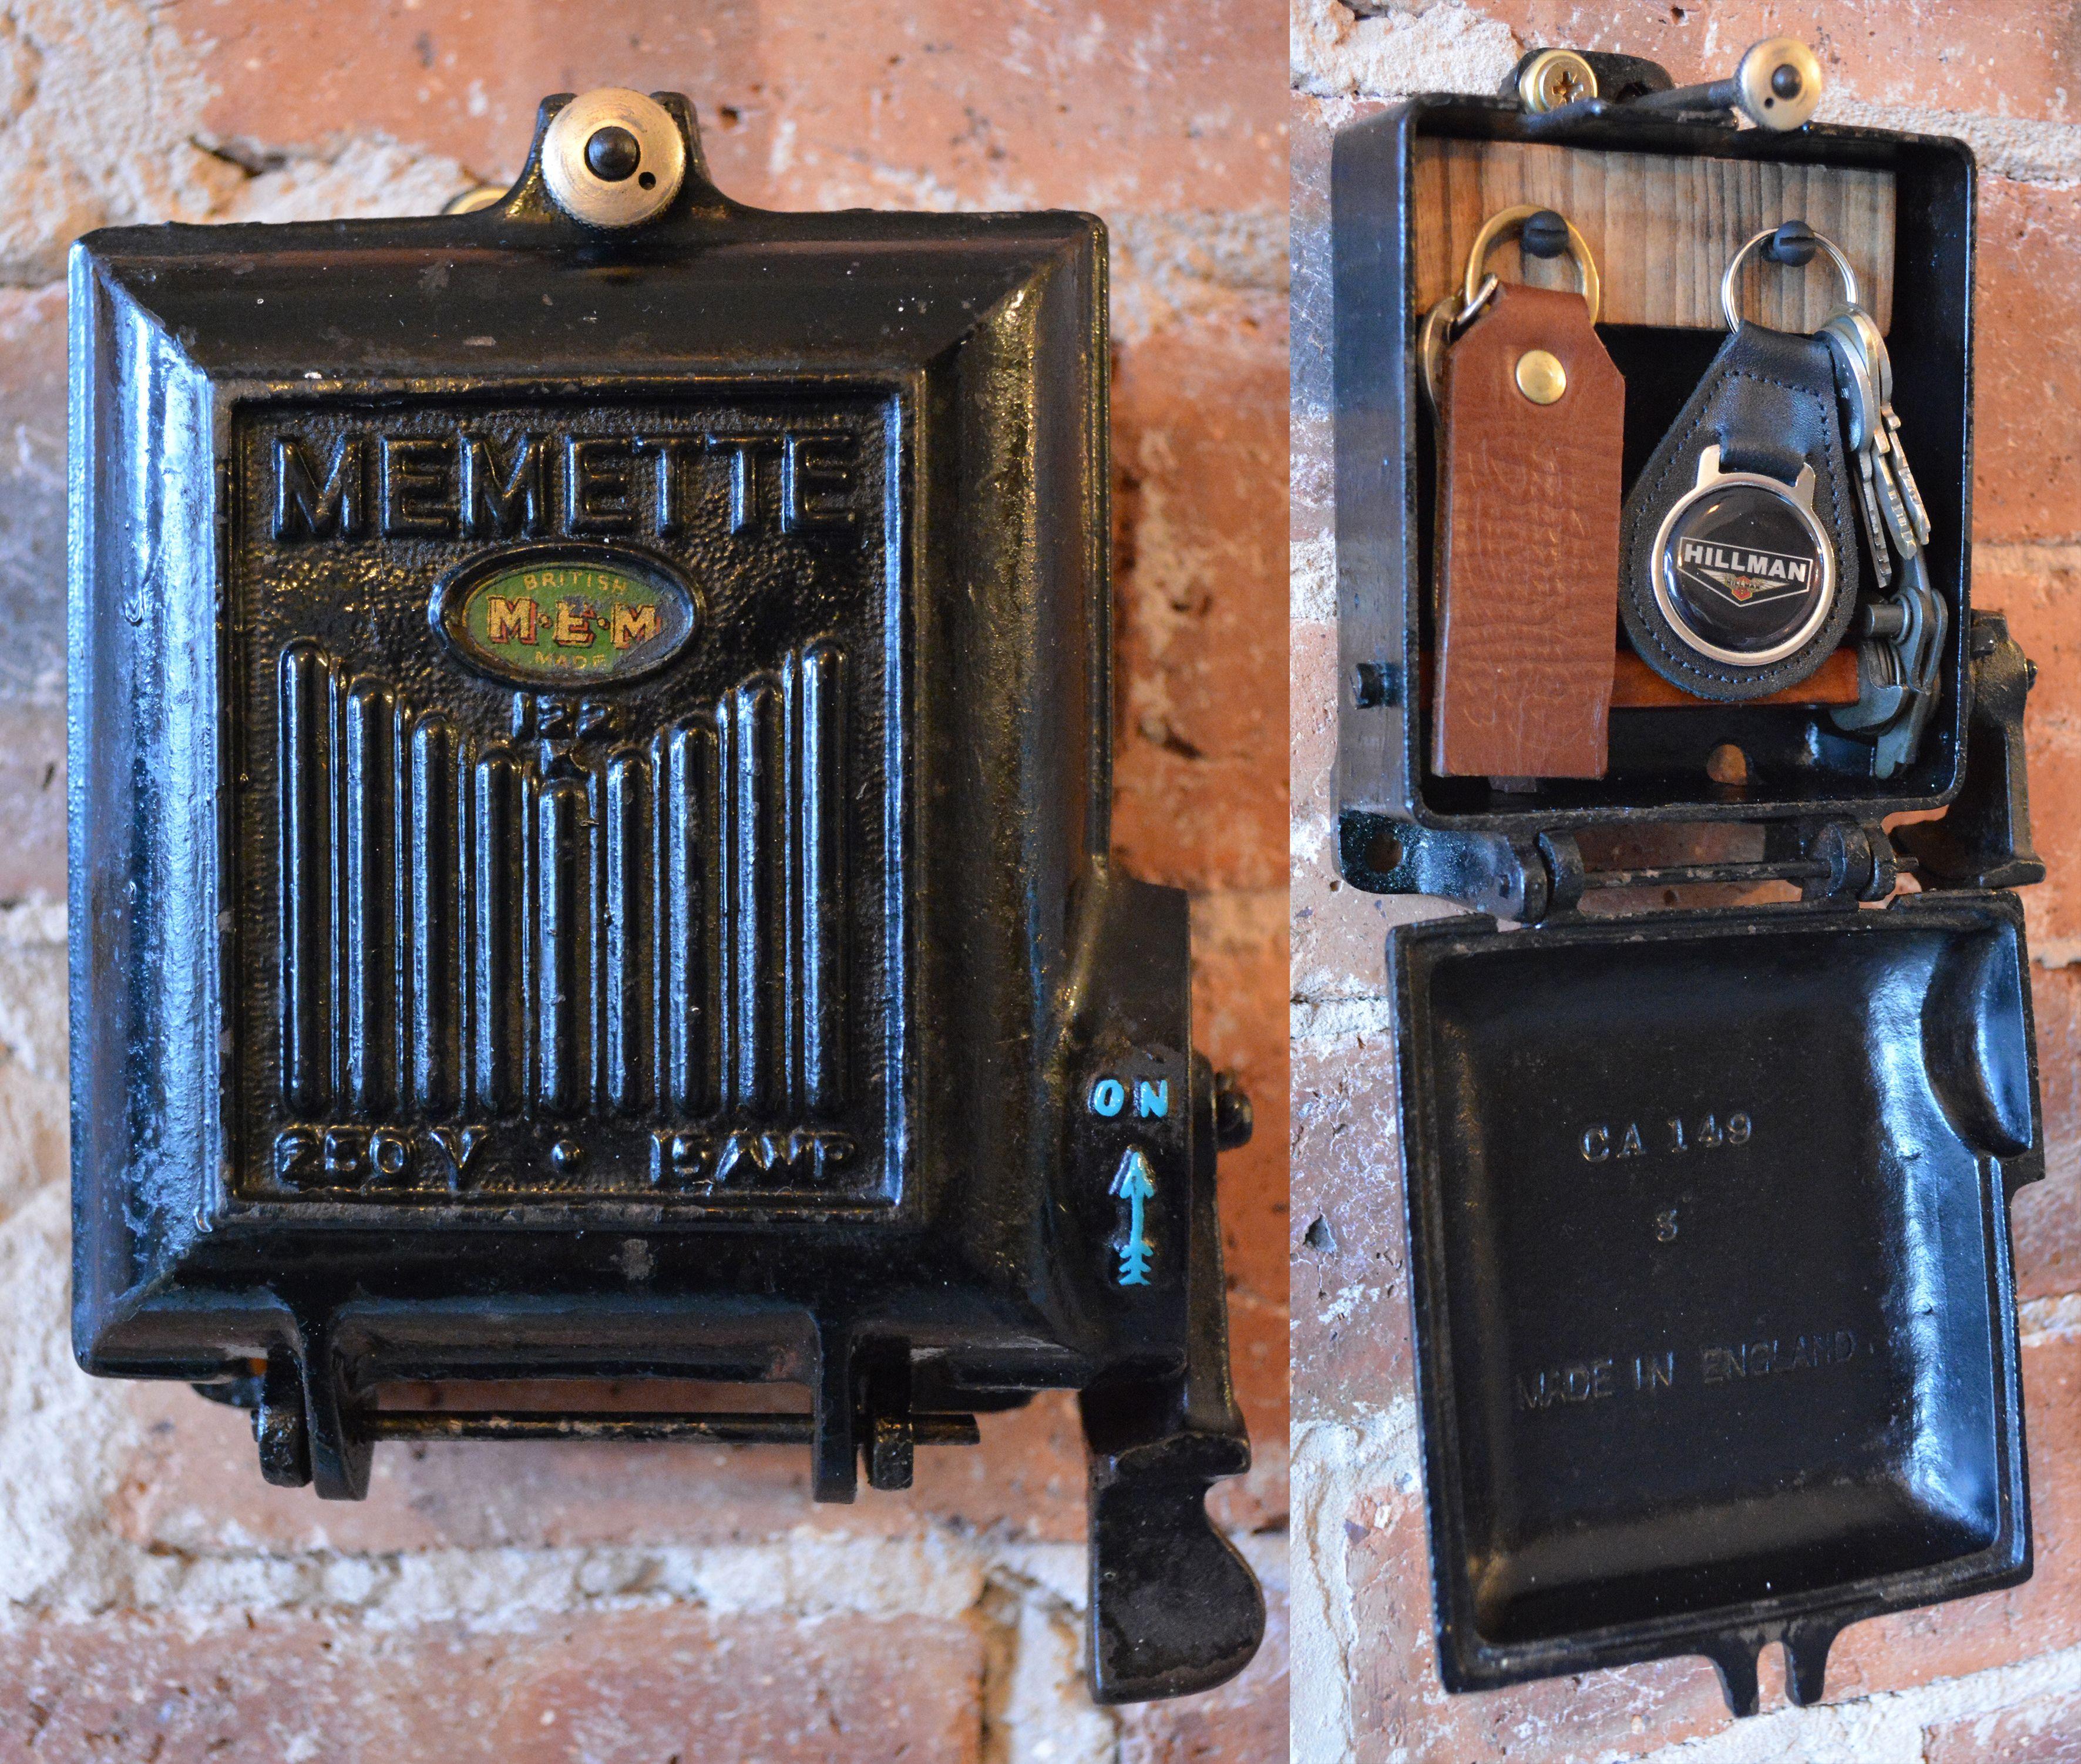 [DVZP_7254]   Cast Iron Key Safe Storage Rack - Converted from an Antique 1940's Memette Fuse  Box. SOLD. #Vintage #Industrial #Manc… | Unique items products, Bike shed,  Creative | Vintage Cast Iron Fuse Box |  | Pinterest